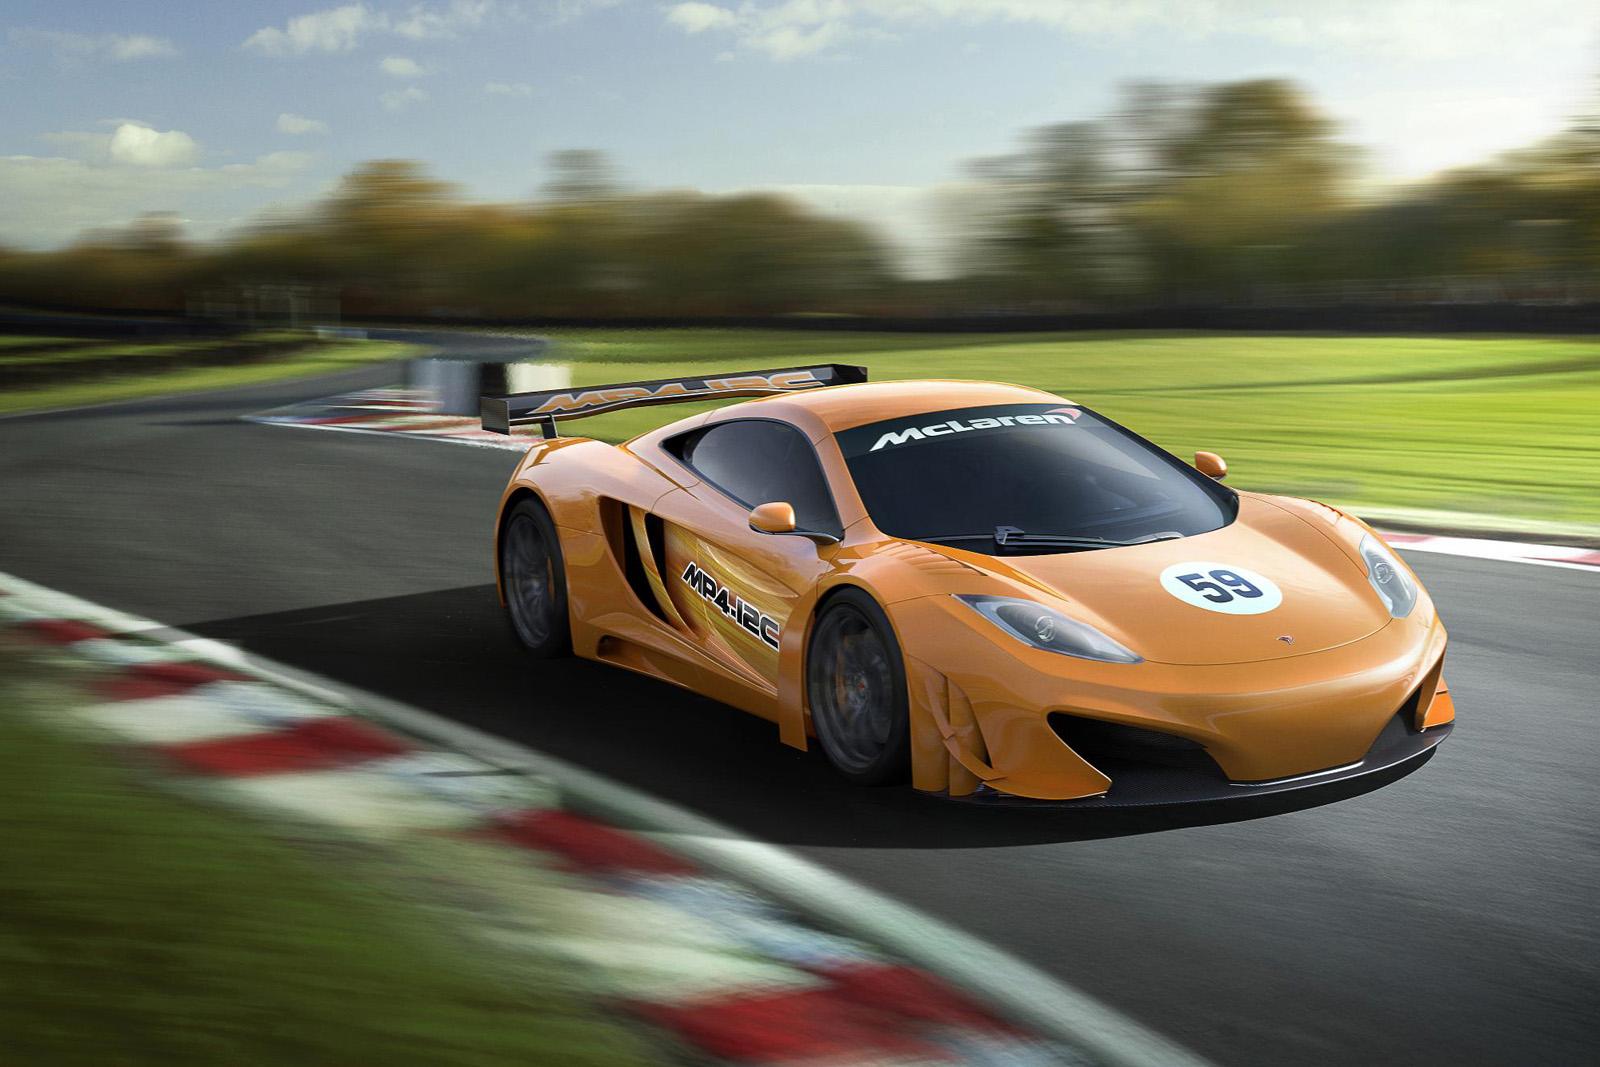 Fantastic Videos Of Car Races Adornment - Classic Cars Ideas - boiq.info